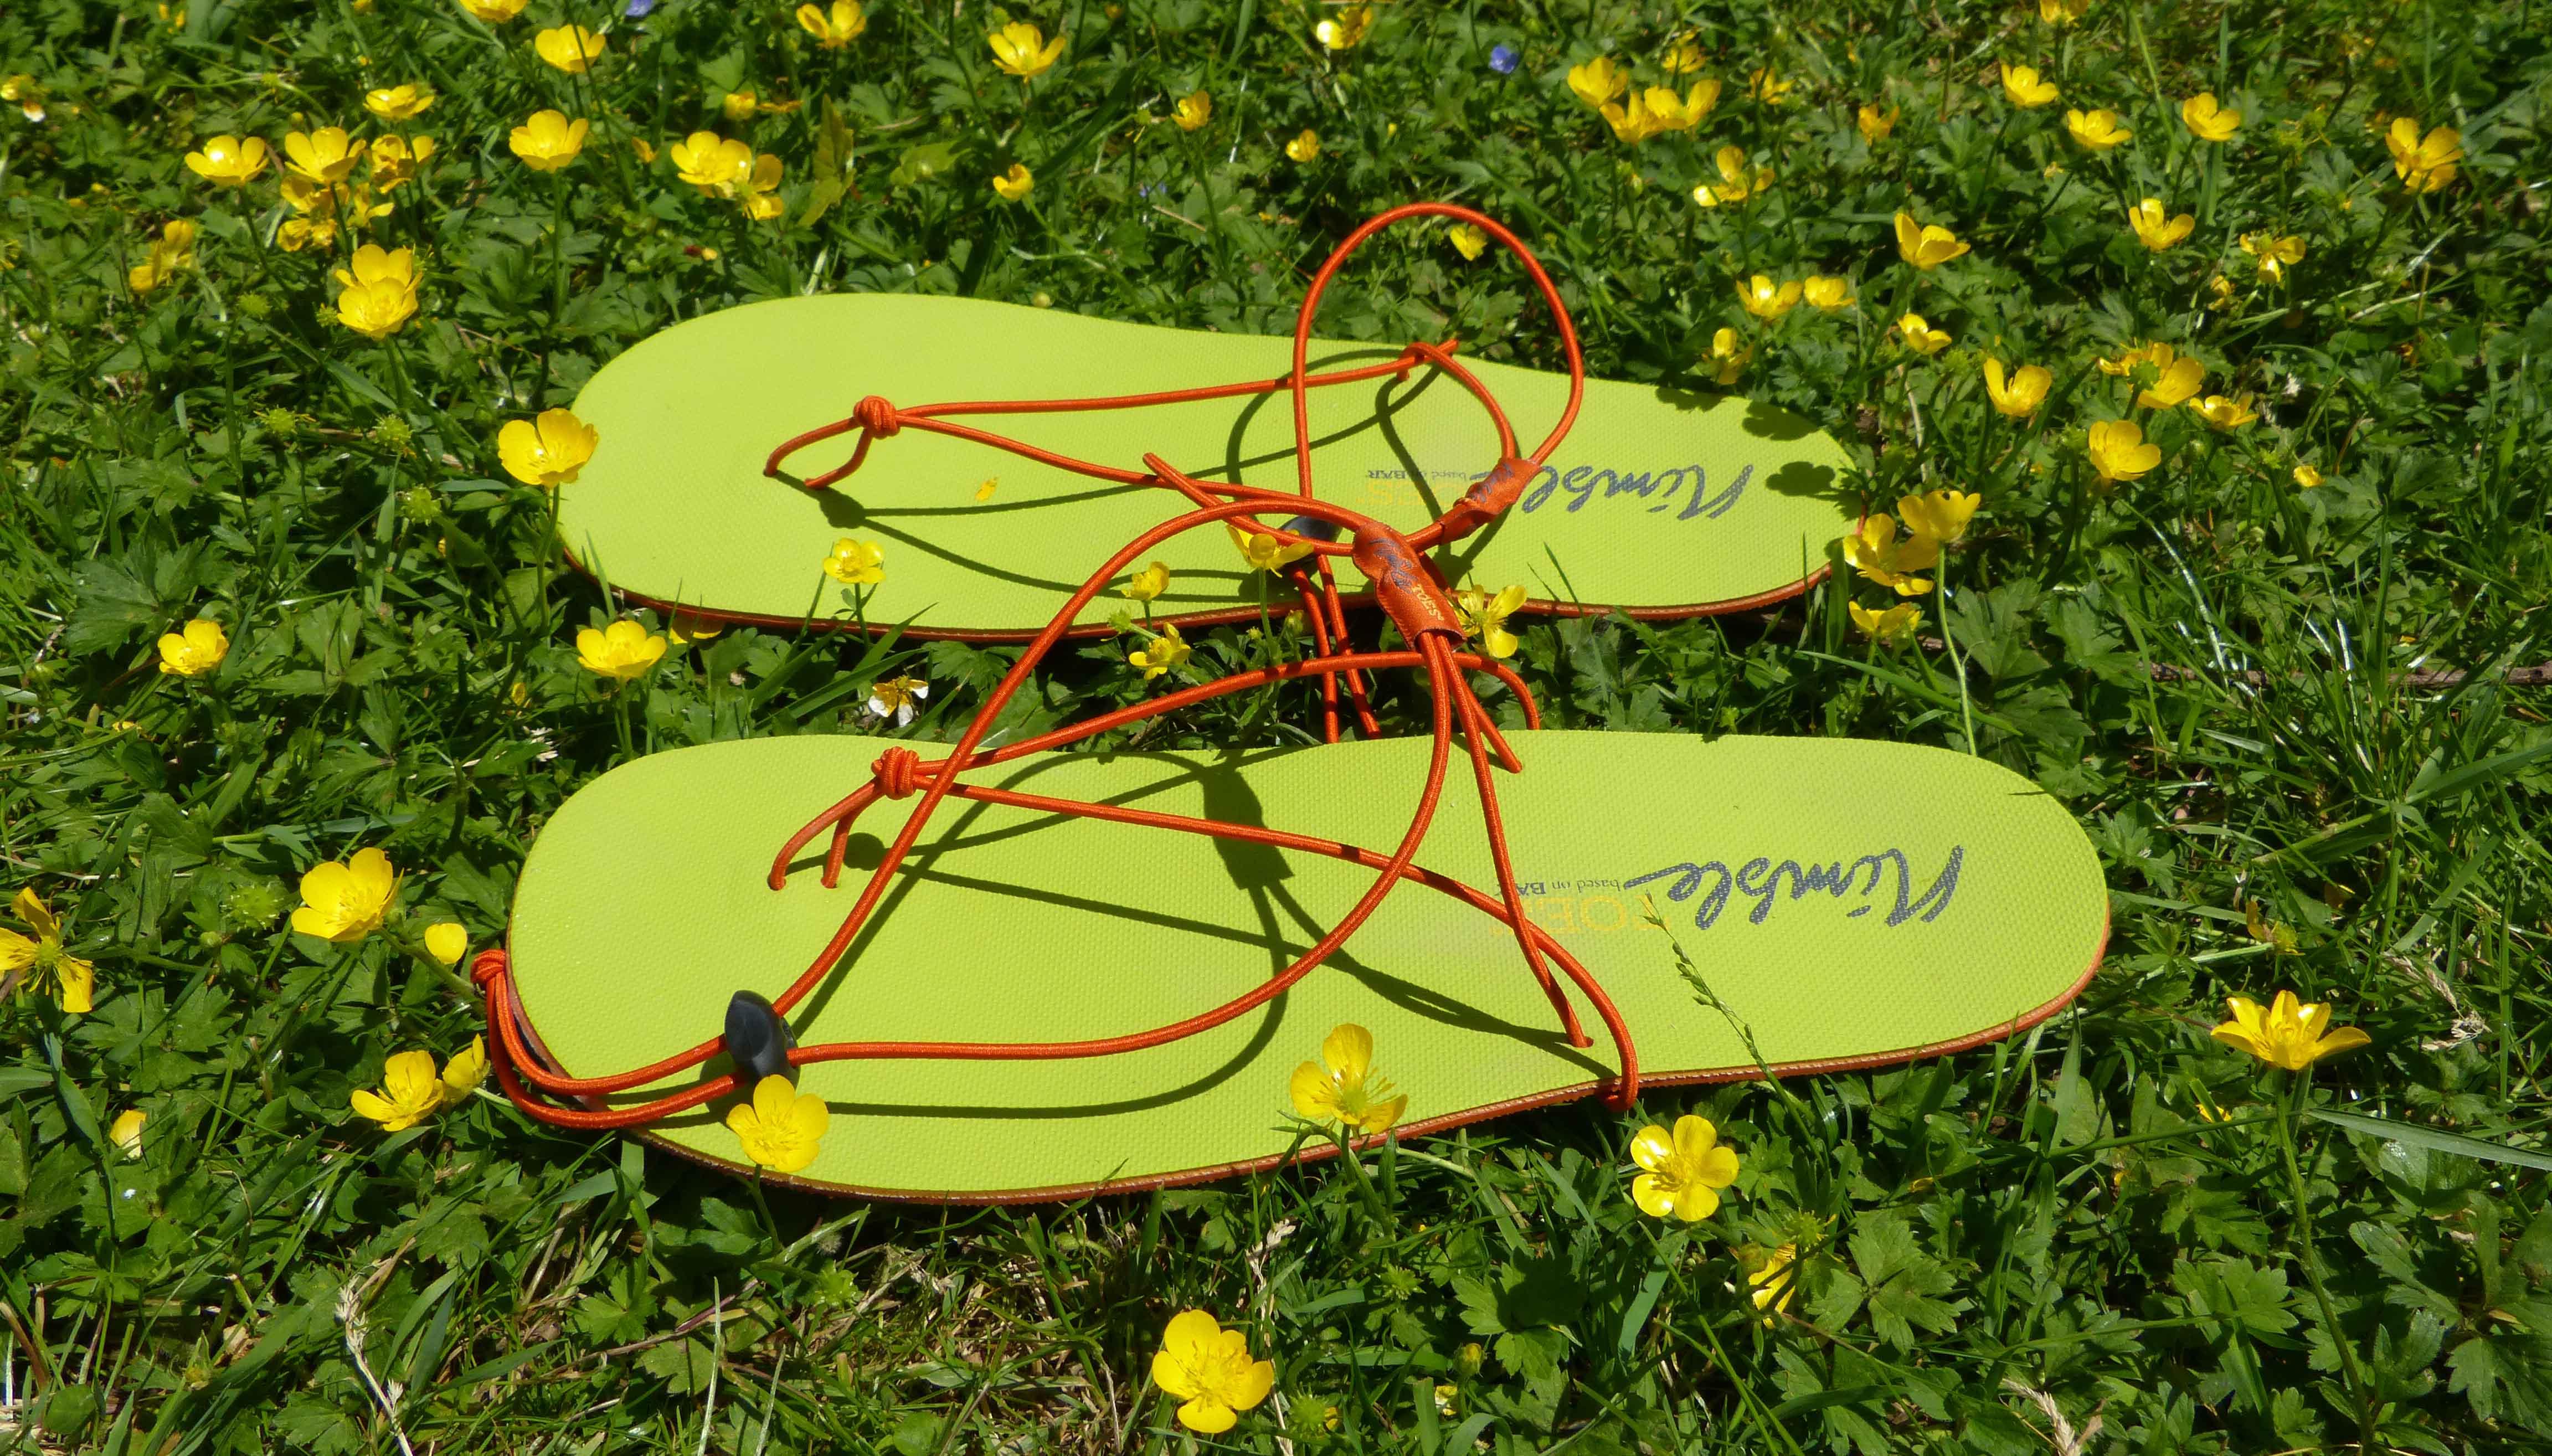 official photos 2357a 3efb6 Warum Flip-Flops keine Barfußschuhe sind. - Equilibrium State DE